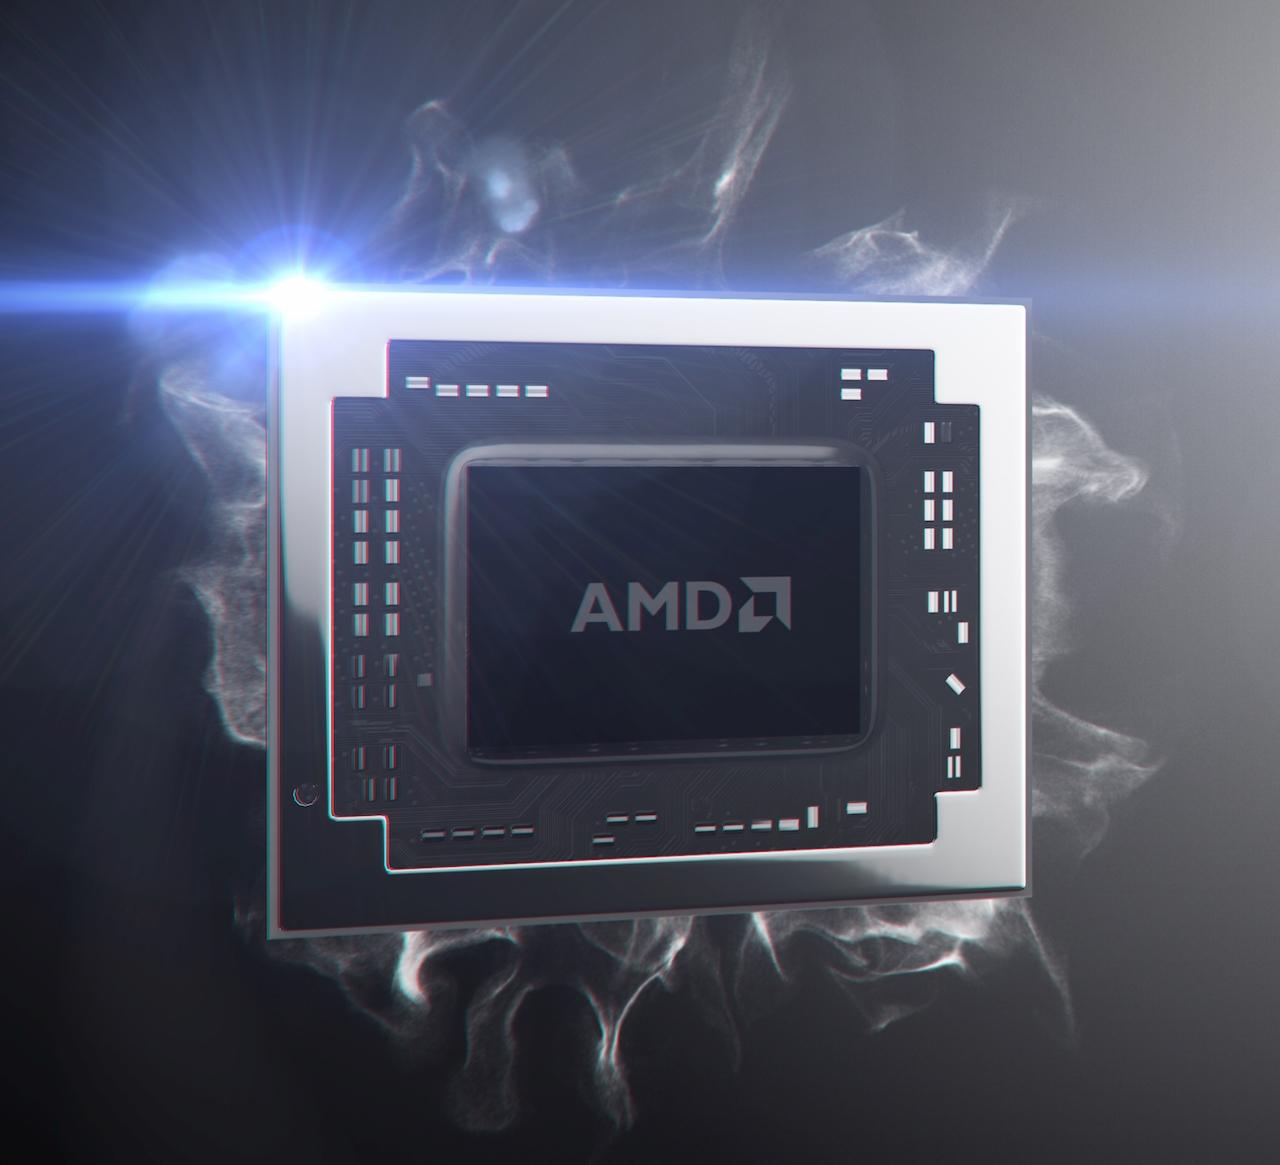 AMD FX-8800P AMD Radeon R7 Driver for PC